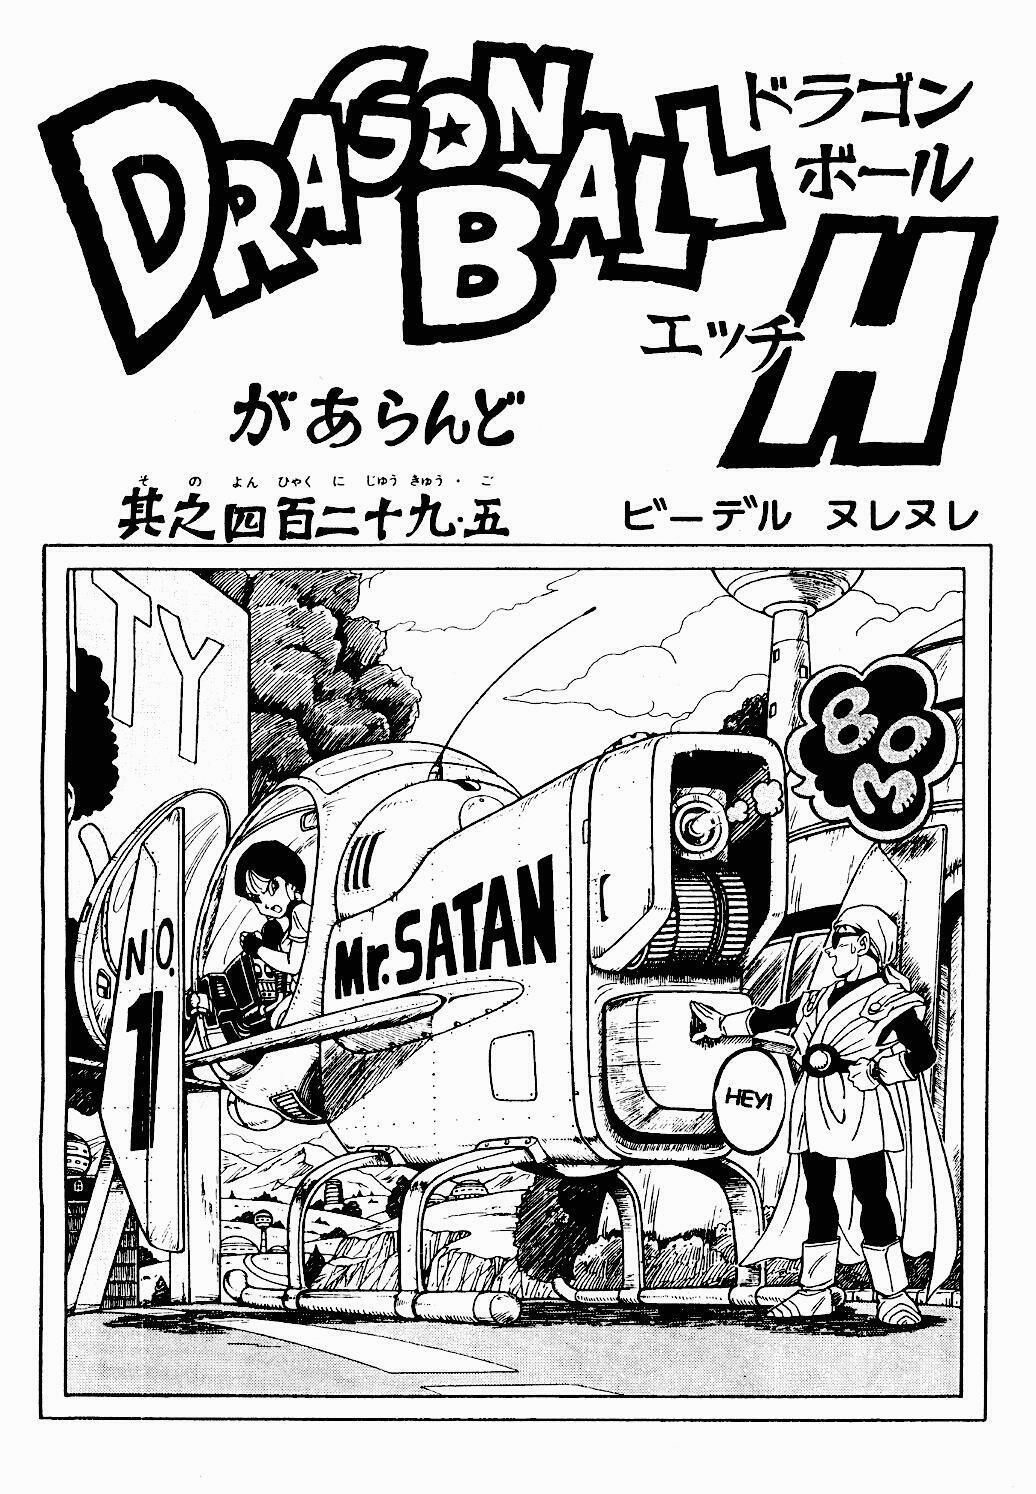 DOUJIN 2000 - Dragonball H 2